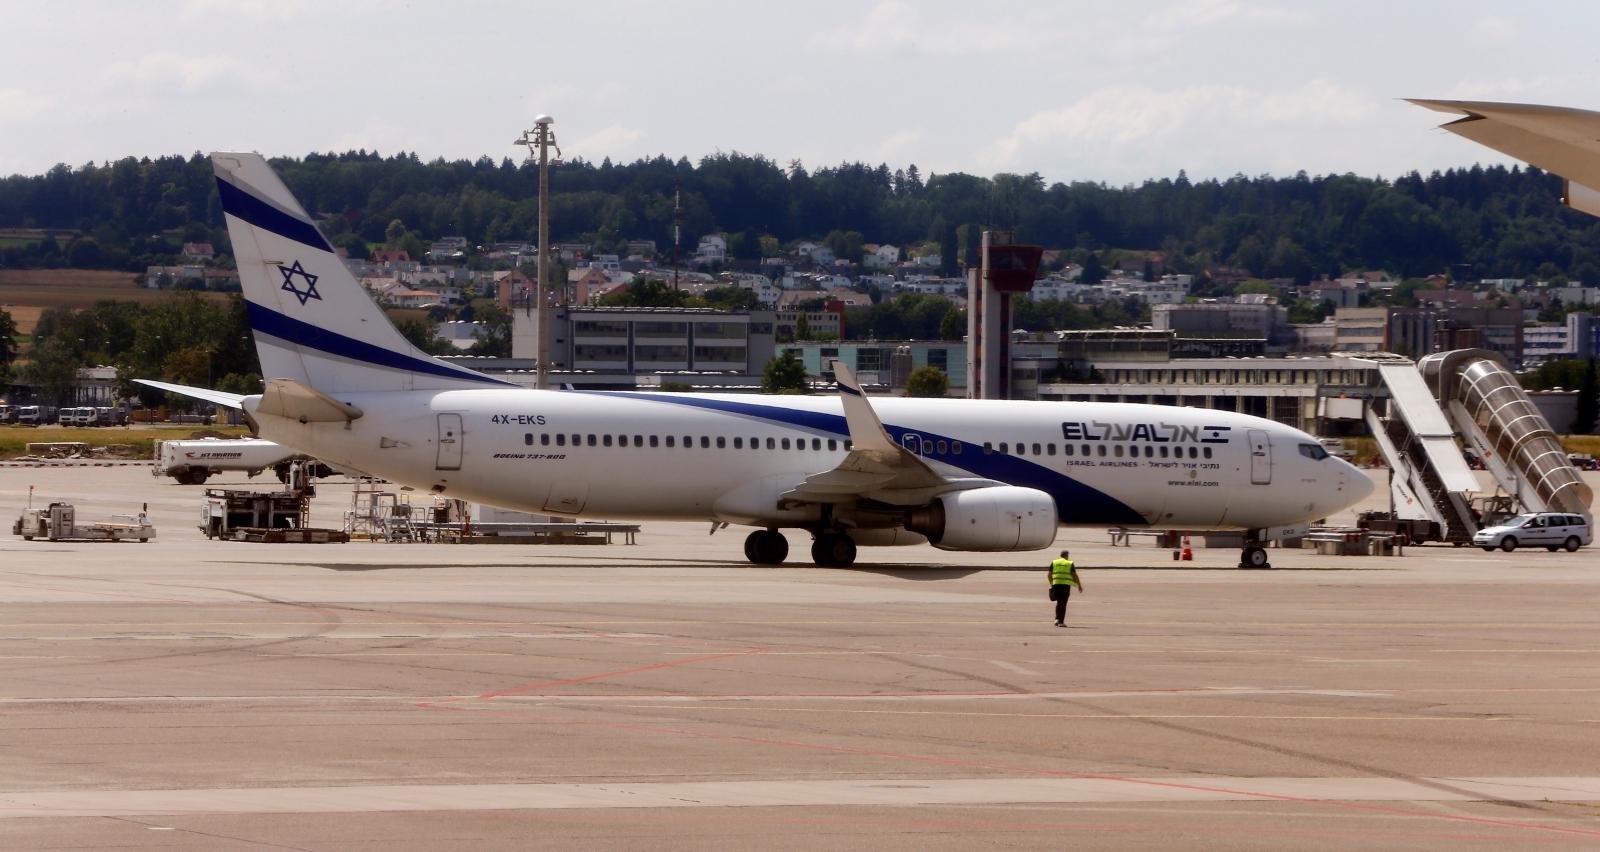 El Al airlines, Israel